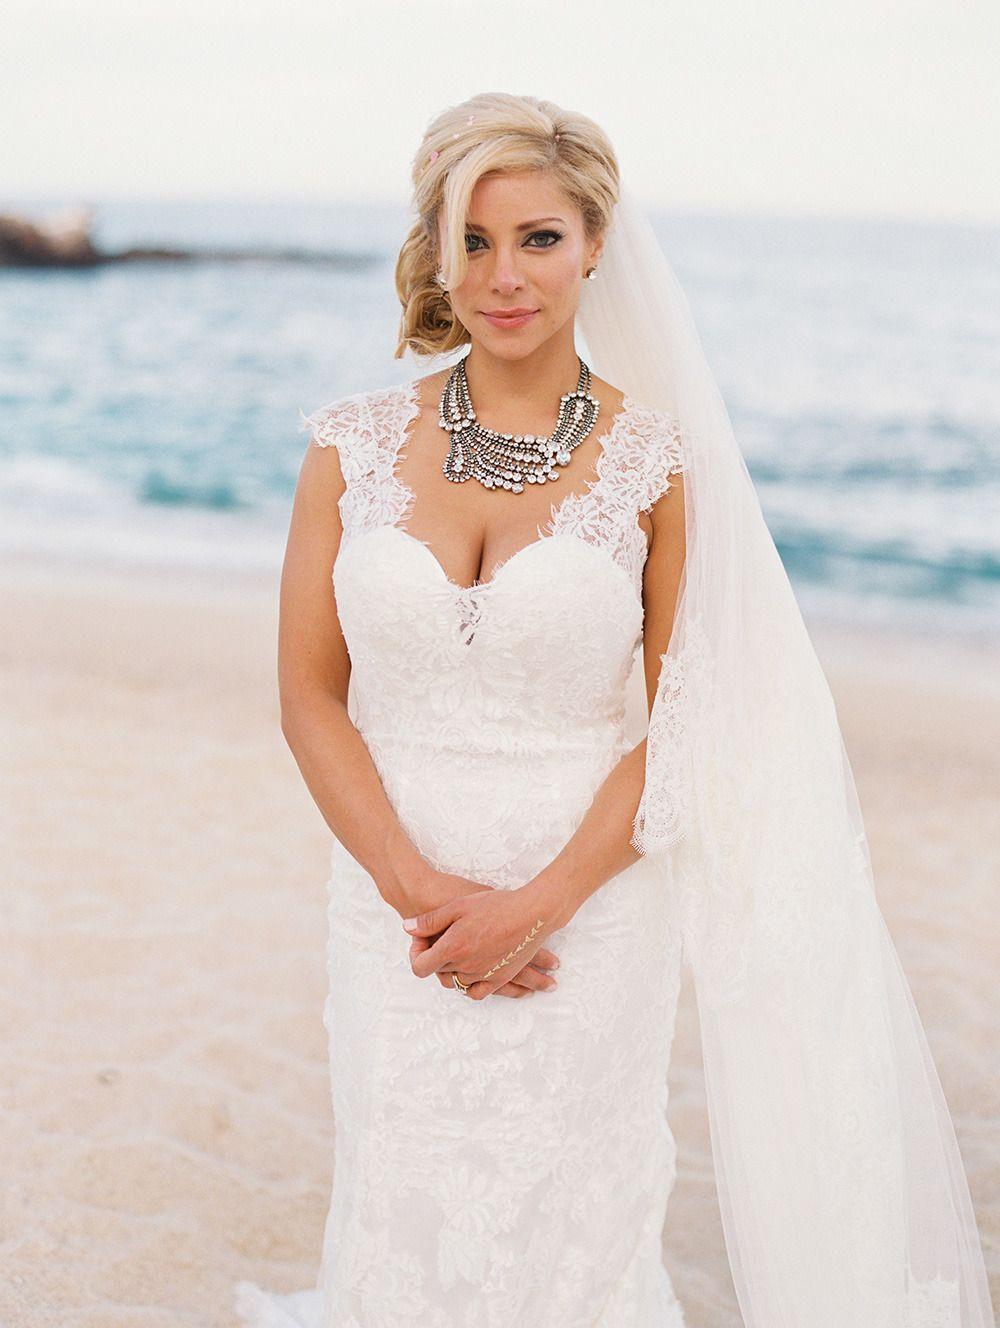 Photography: Lane Dittoe - lanedittoe.com  Read More: http://www.stylemepretty.com/destination-weddings/2014/08/06/intimate-cabo-san-lucas-beach-wedding-at-villa-captiva-in-punta-bella/